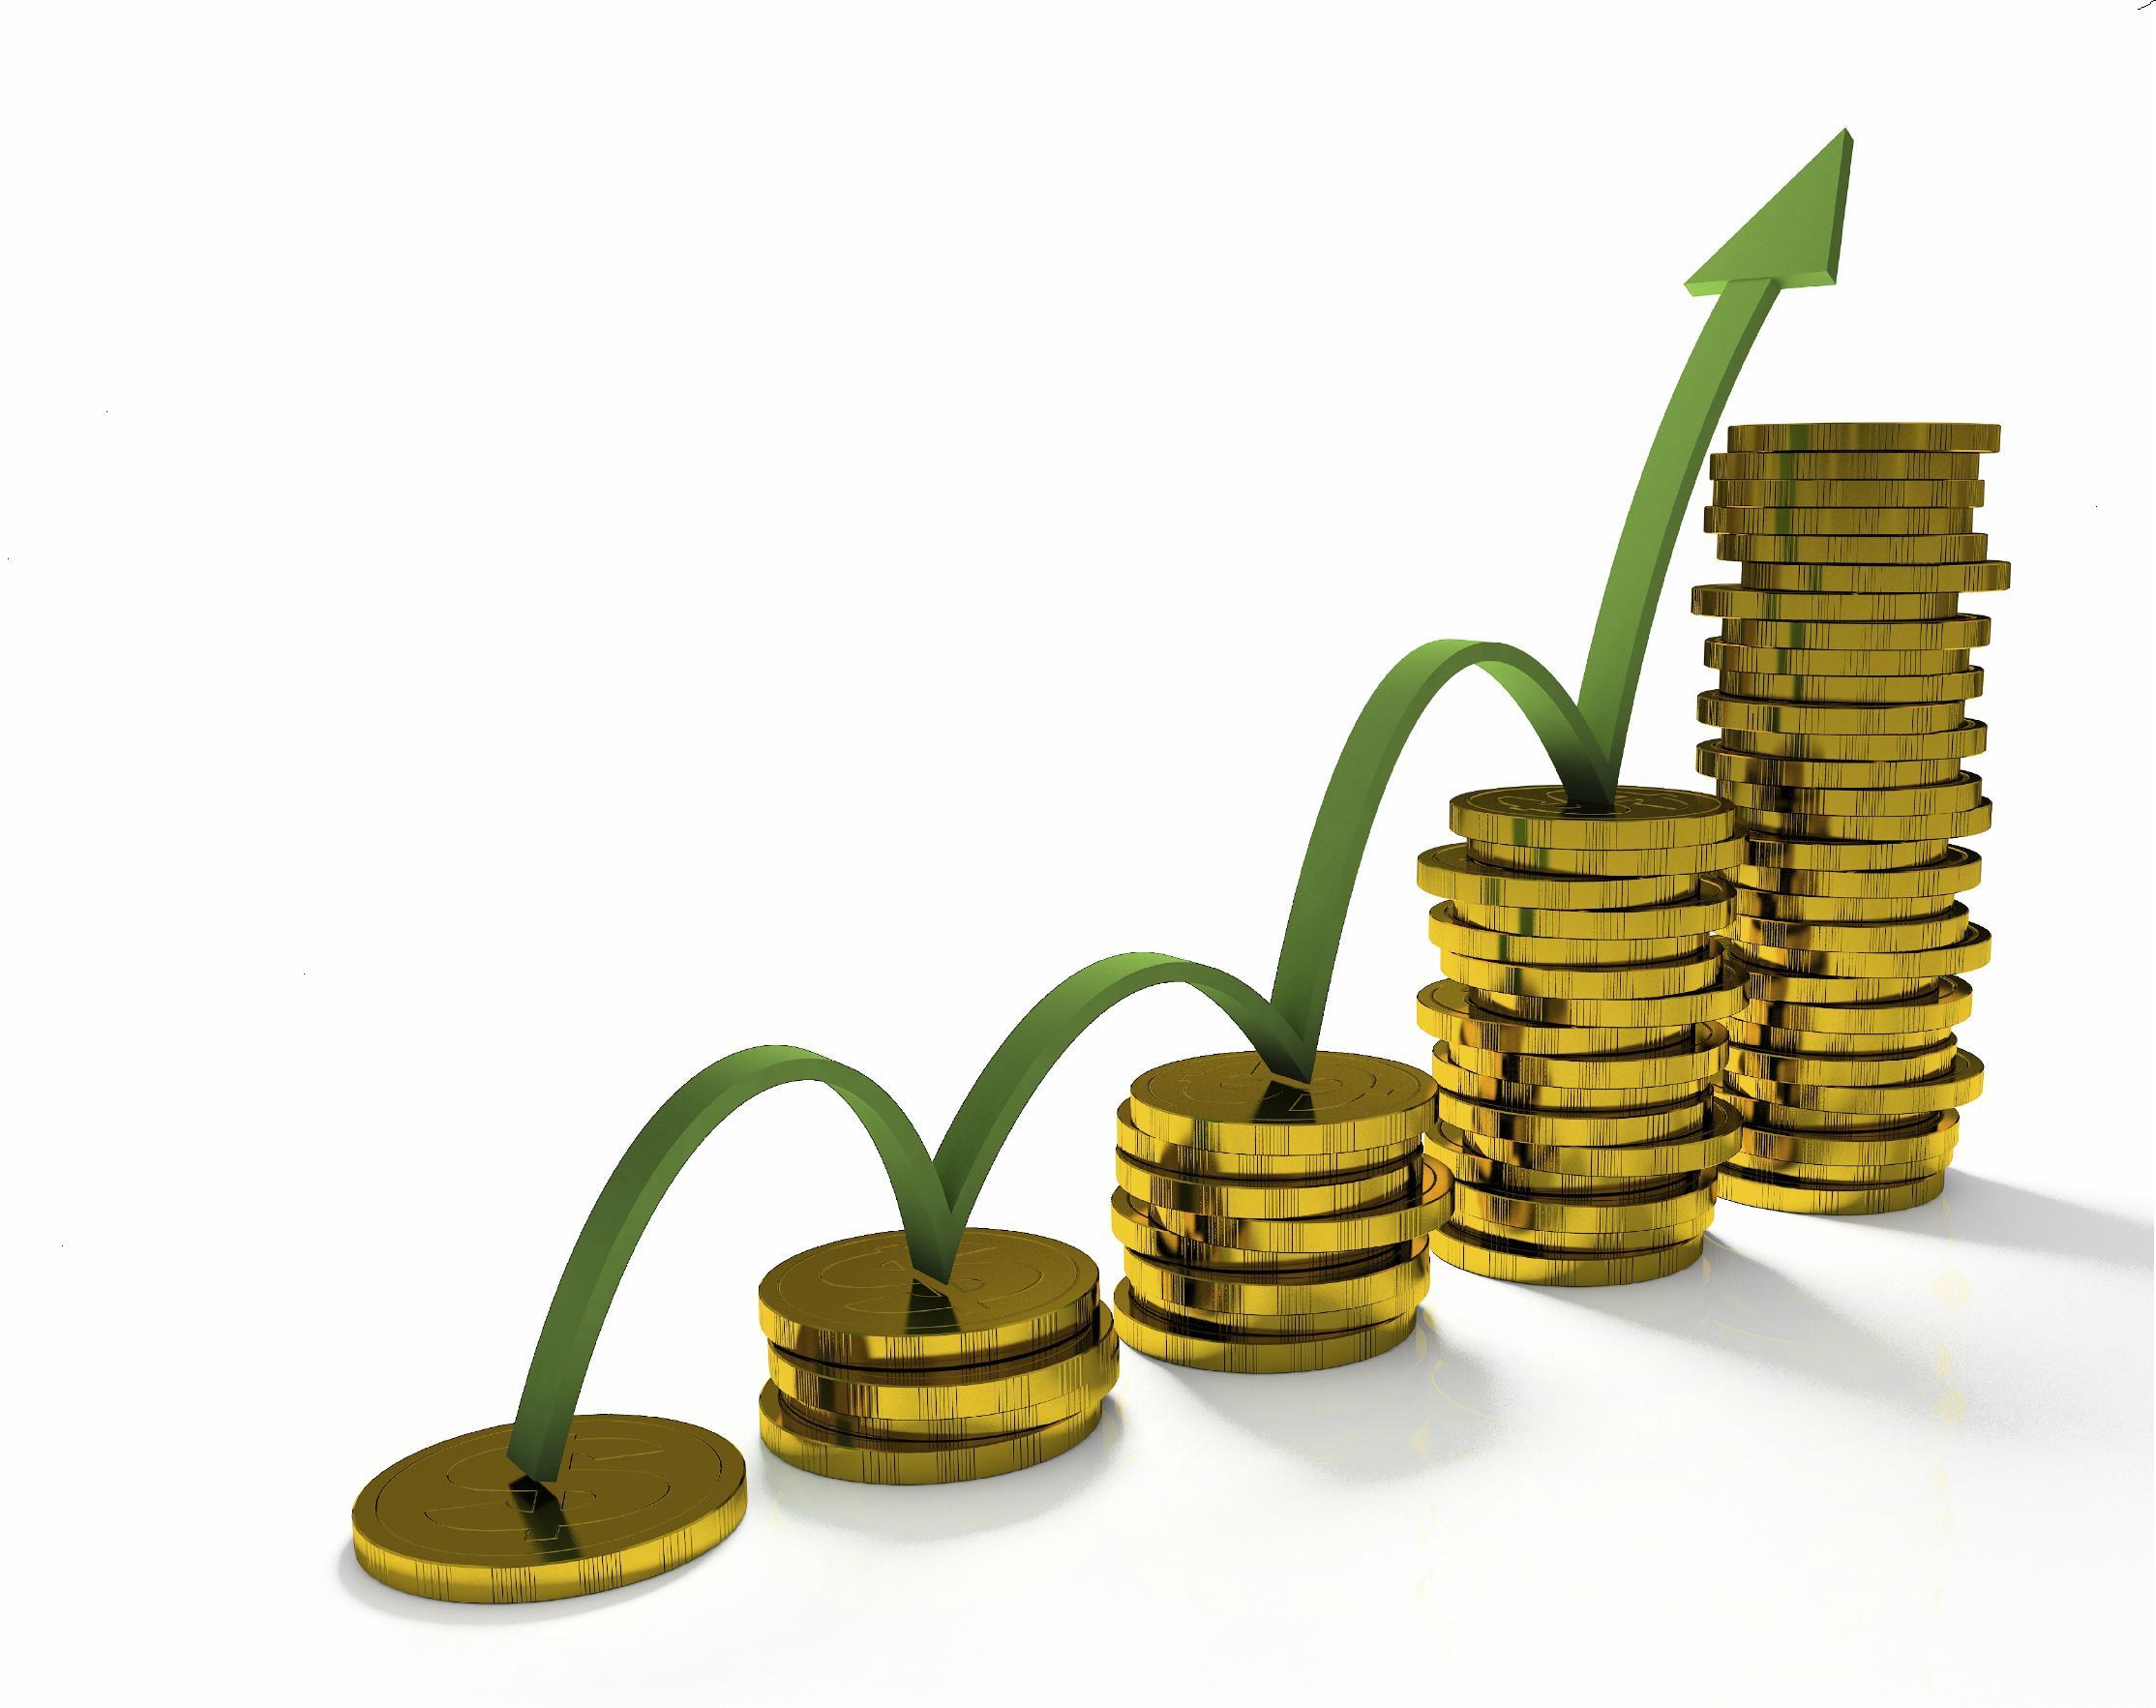 investing-money-into-blogging.jpg (2228×1765)